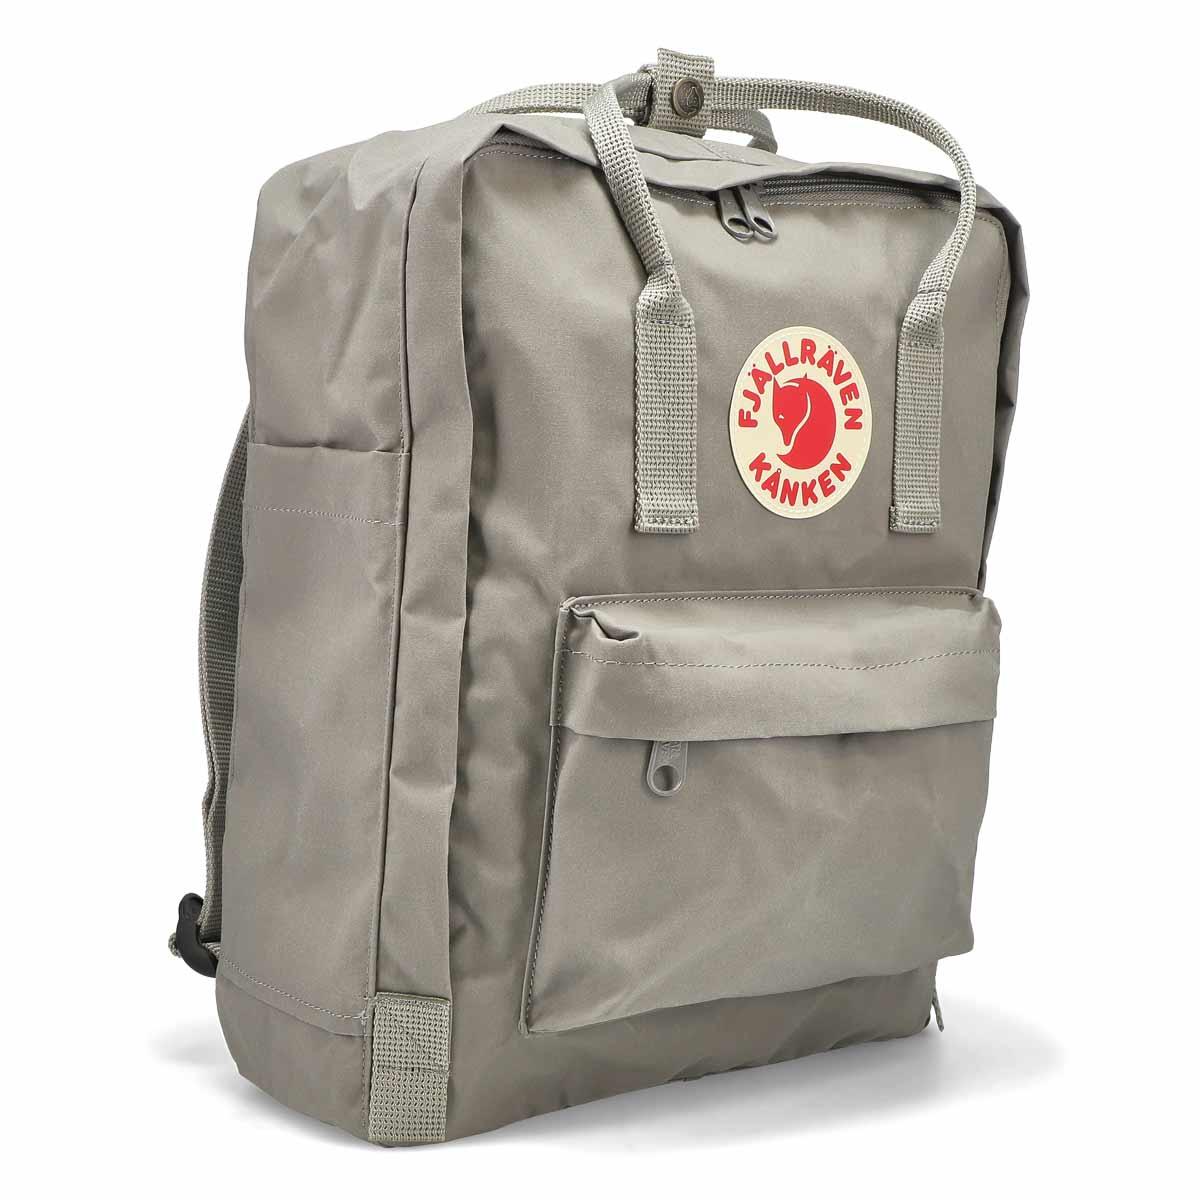 Fjallraven Kanken fog backpack